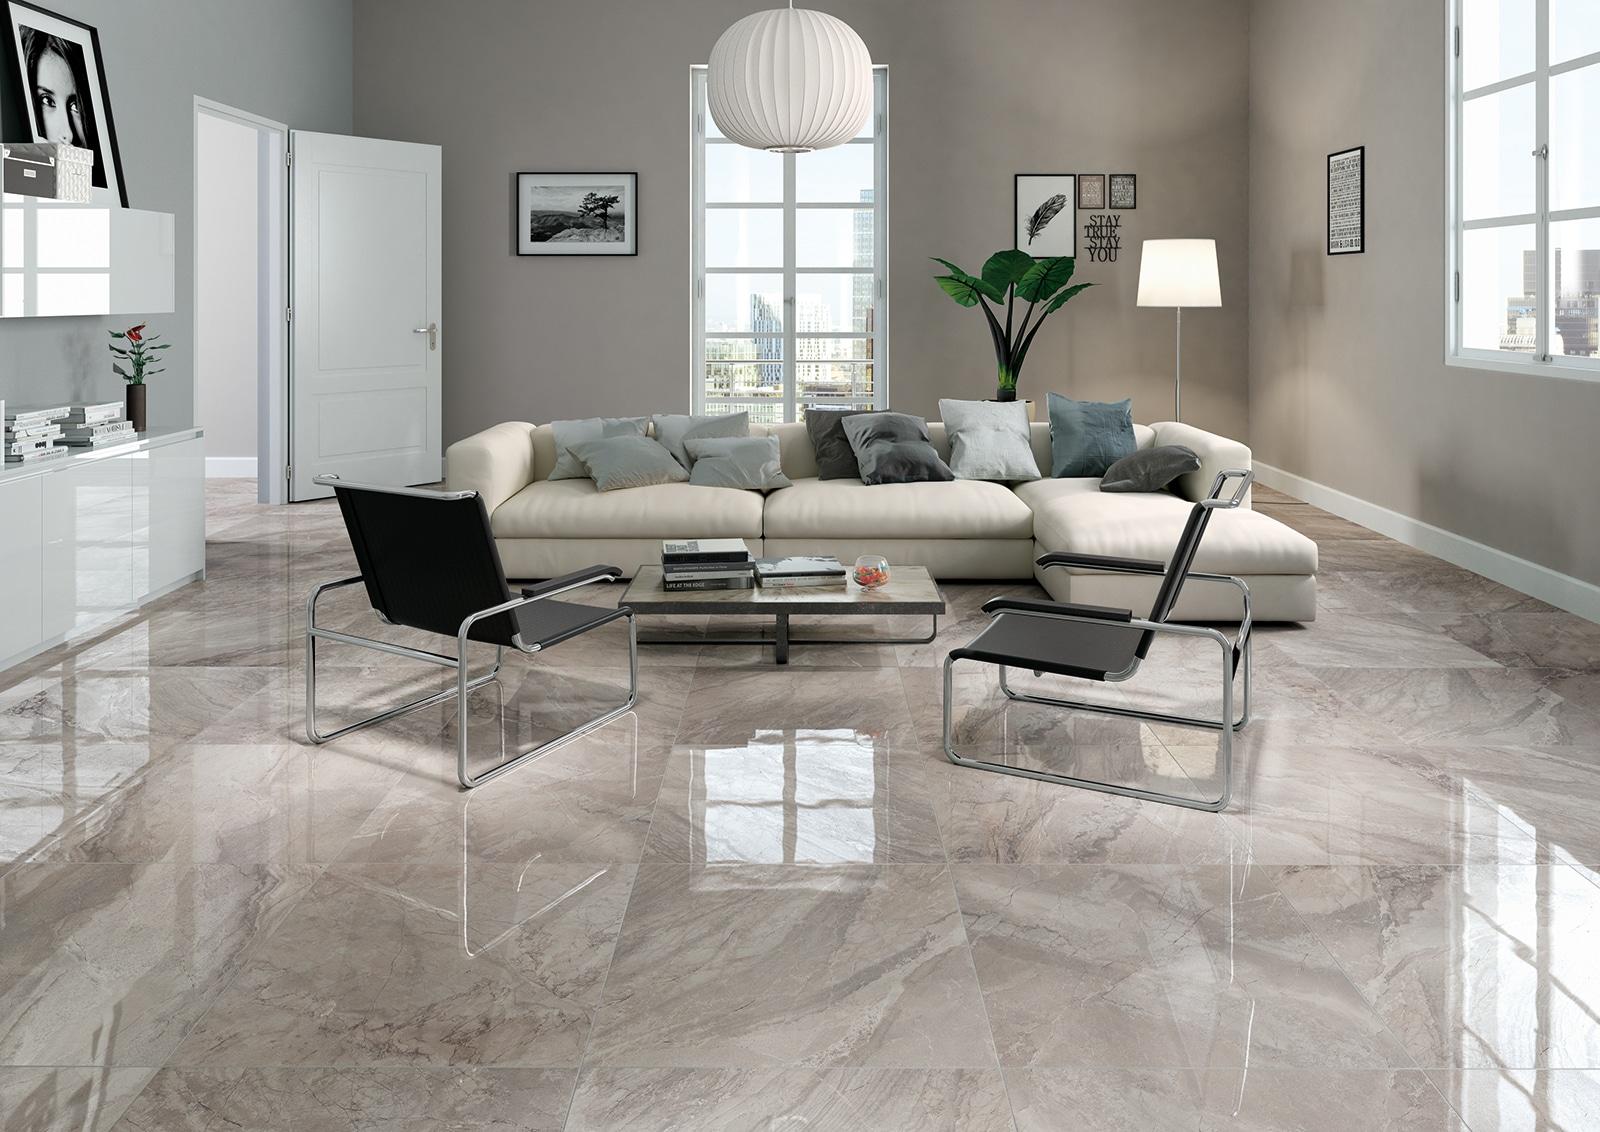 Pavimenti Moderni Senza Fughe pavimenti di design: le ultime tendenze - glamouraffair